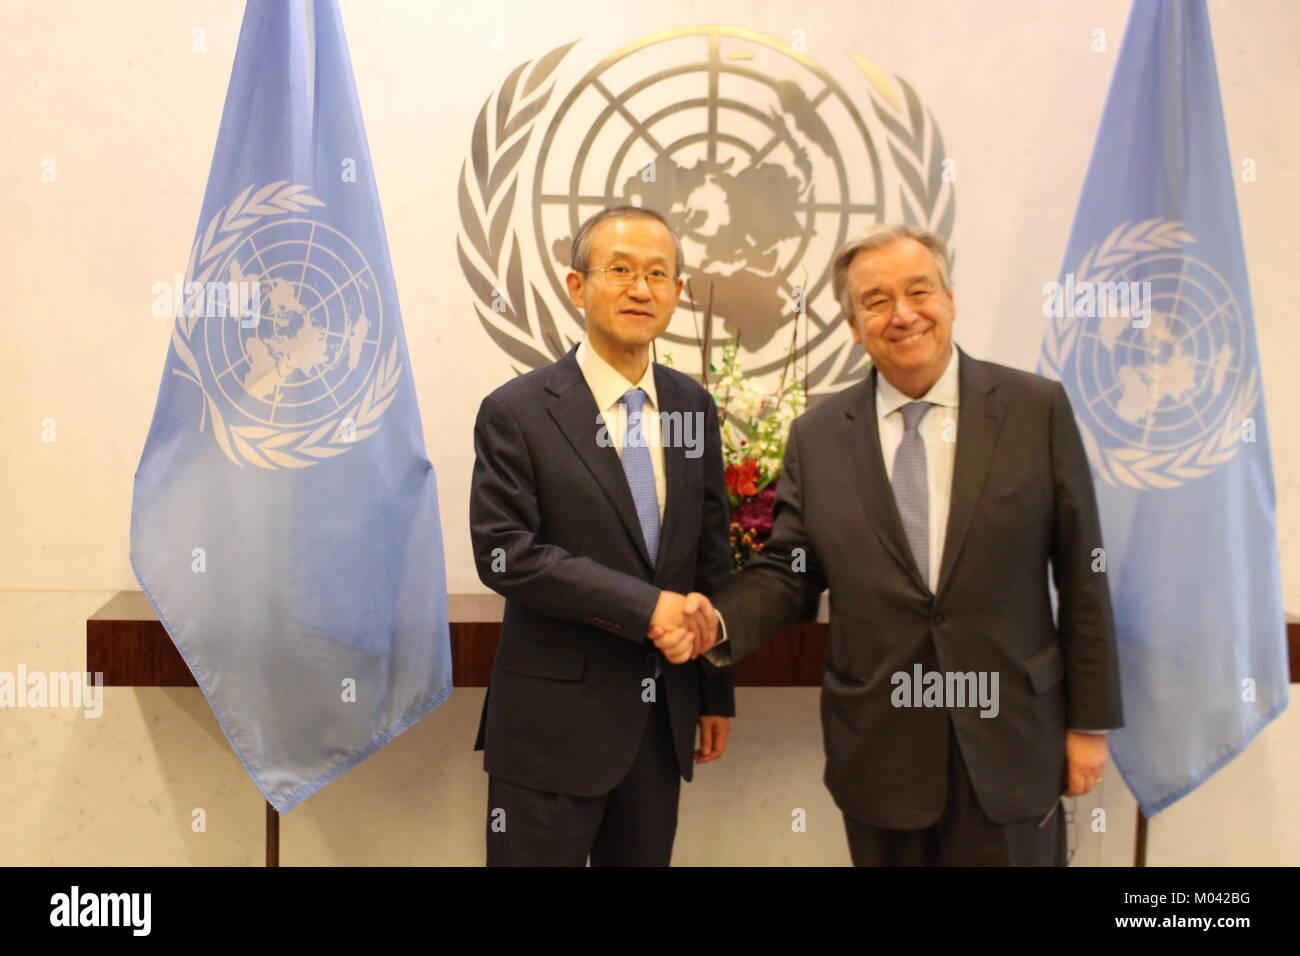 UN, New York, USA. 18th Jan, 2018. UN Sec-Gen Antonio Guterres met Lim Sung-nam, First Vice Foreign Minister, RepublicStock Photo